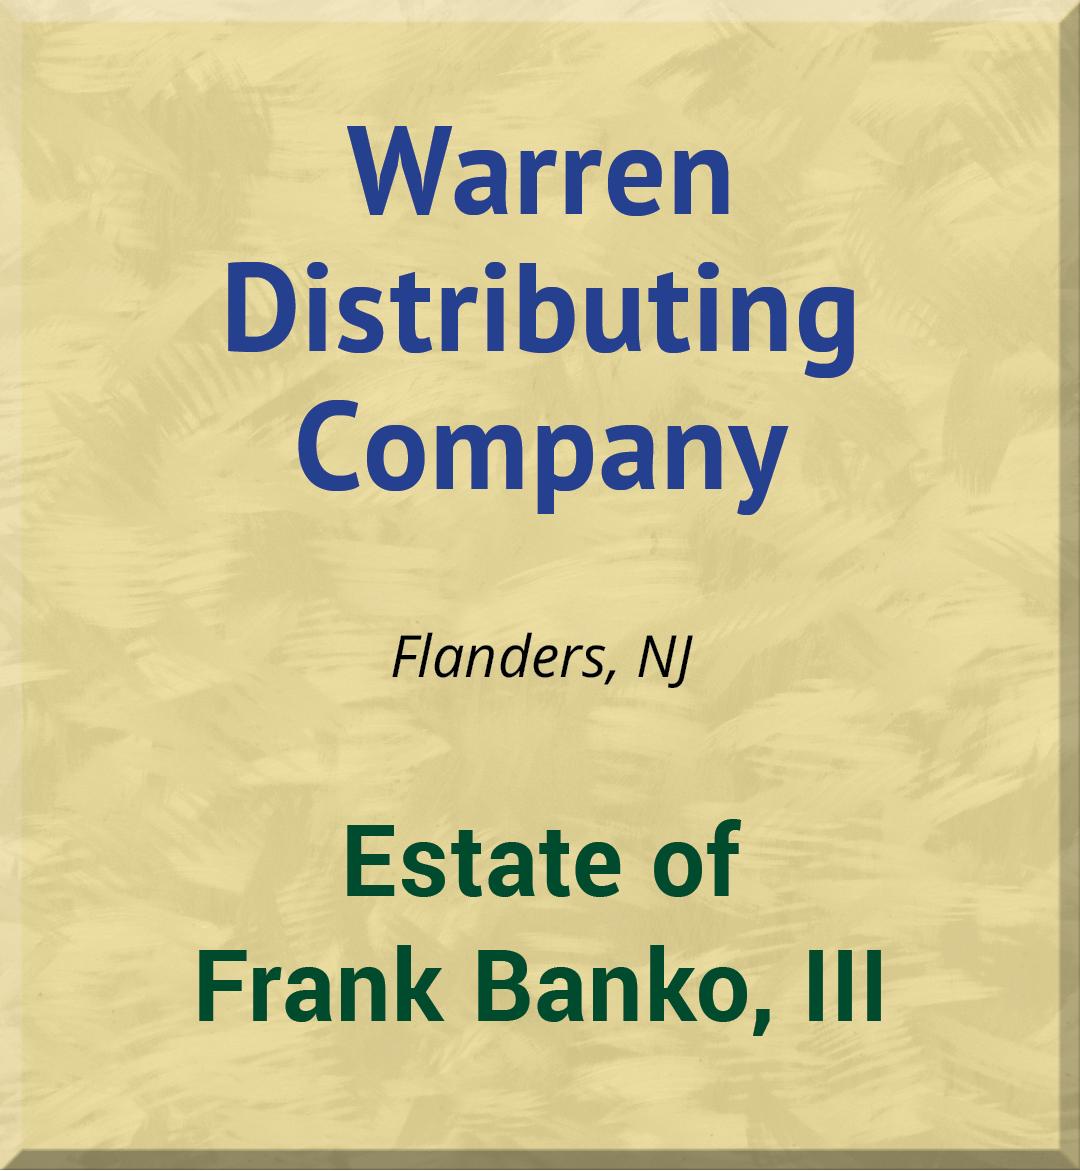 Warren Distributing Company